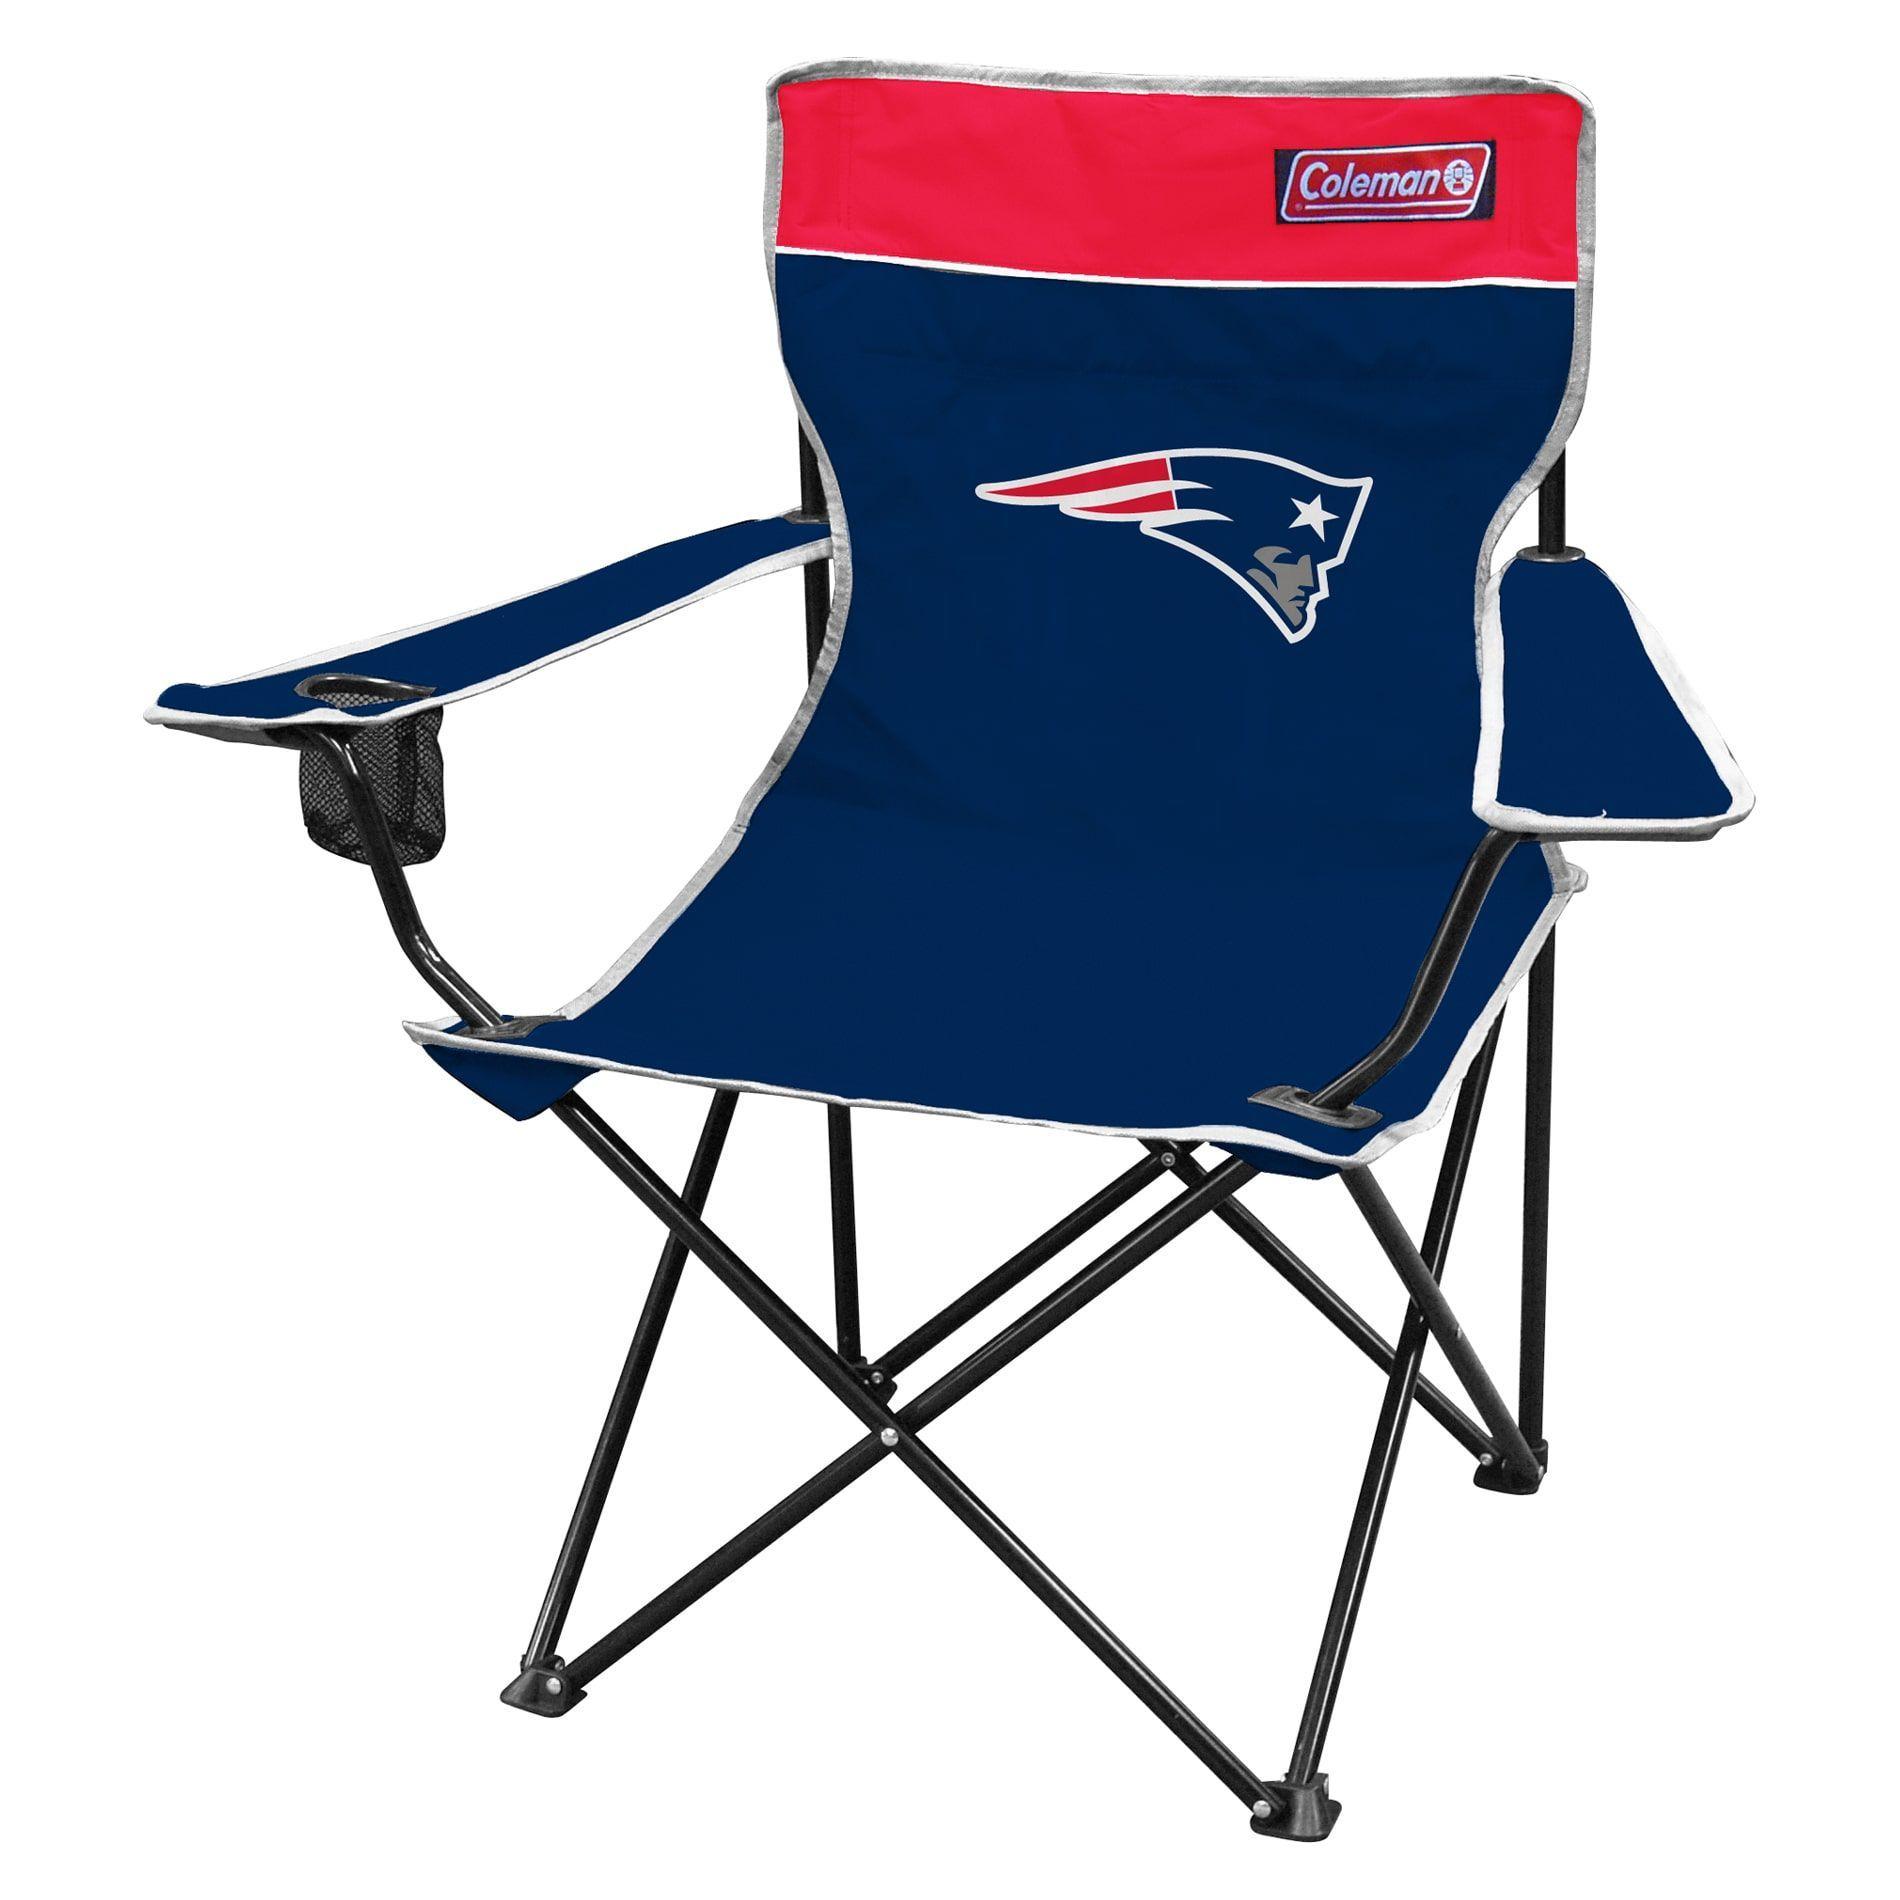 Coleman NFL New England Patriots Quad Tailgate Chair